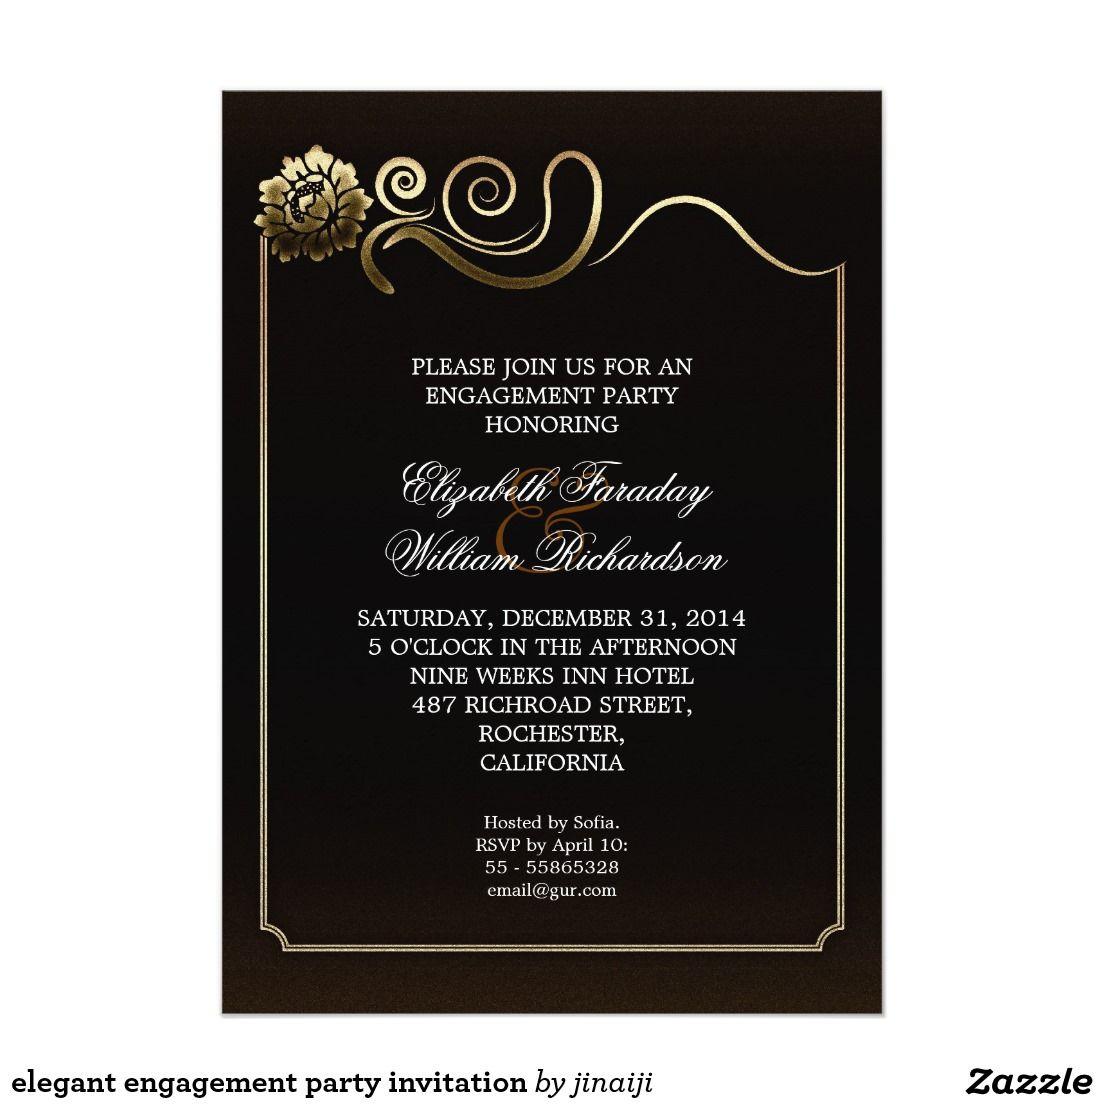 elegant engagement party invitation   Wedding :Engagement Party ...